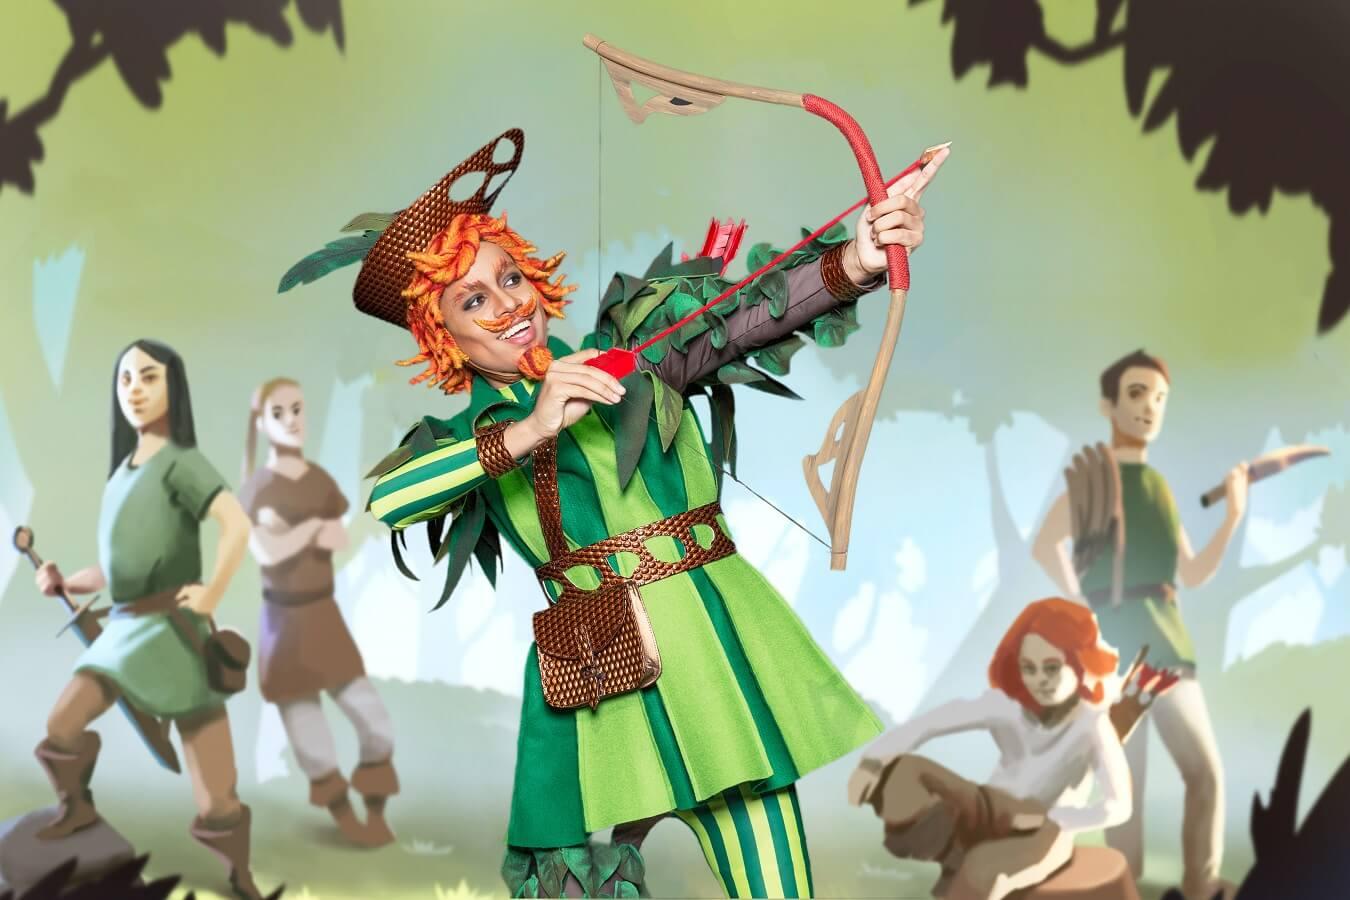 Robin in seiner Hood